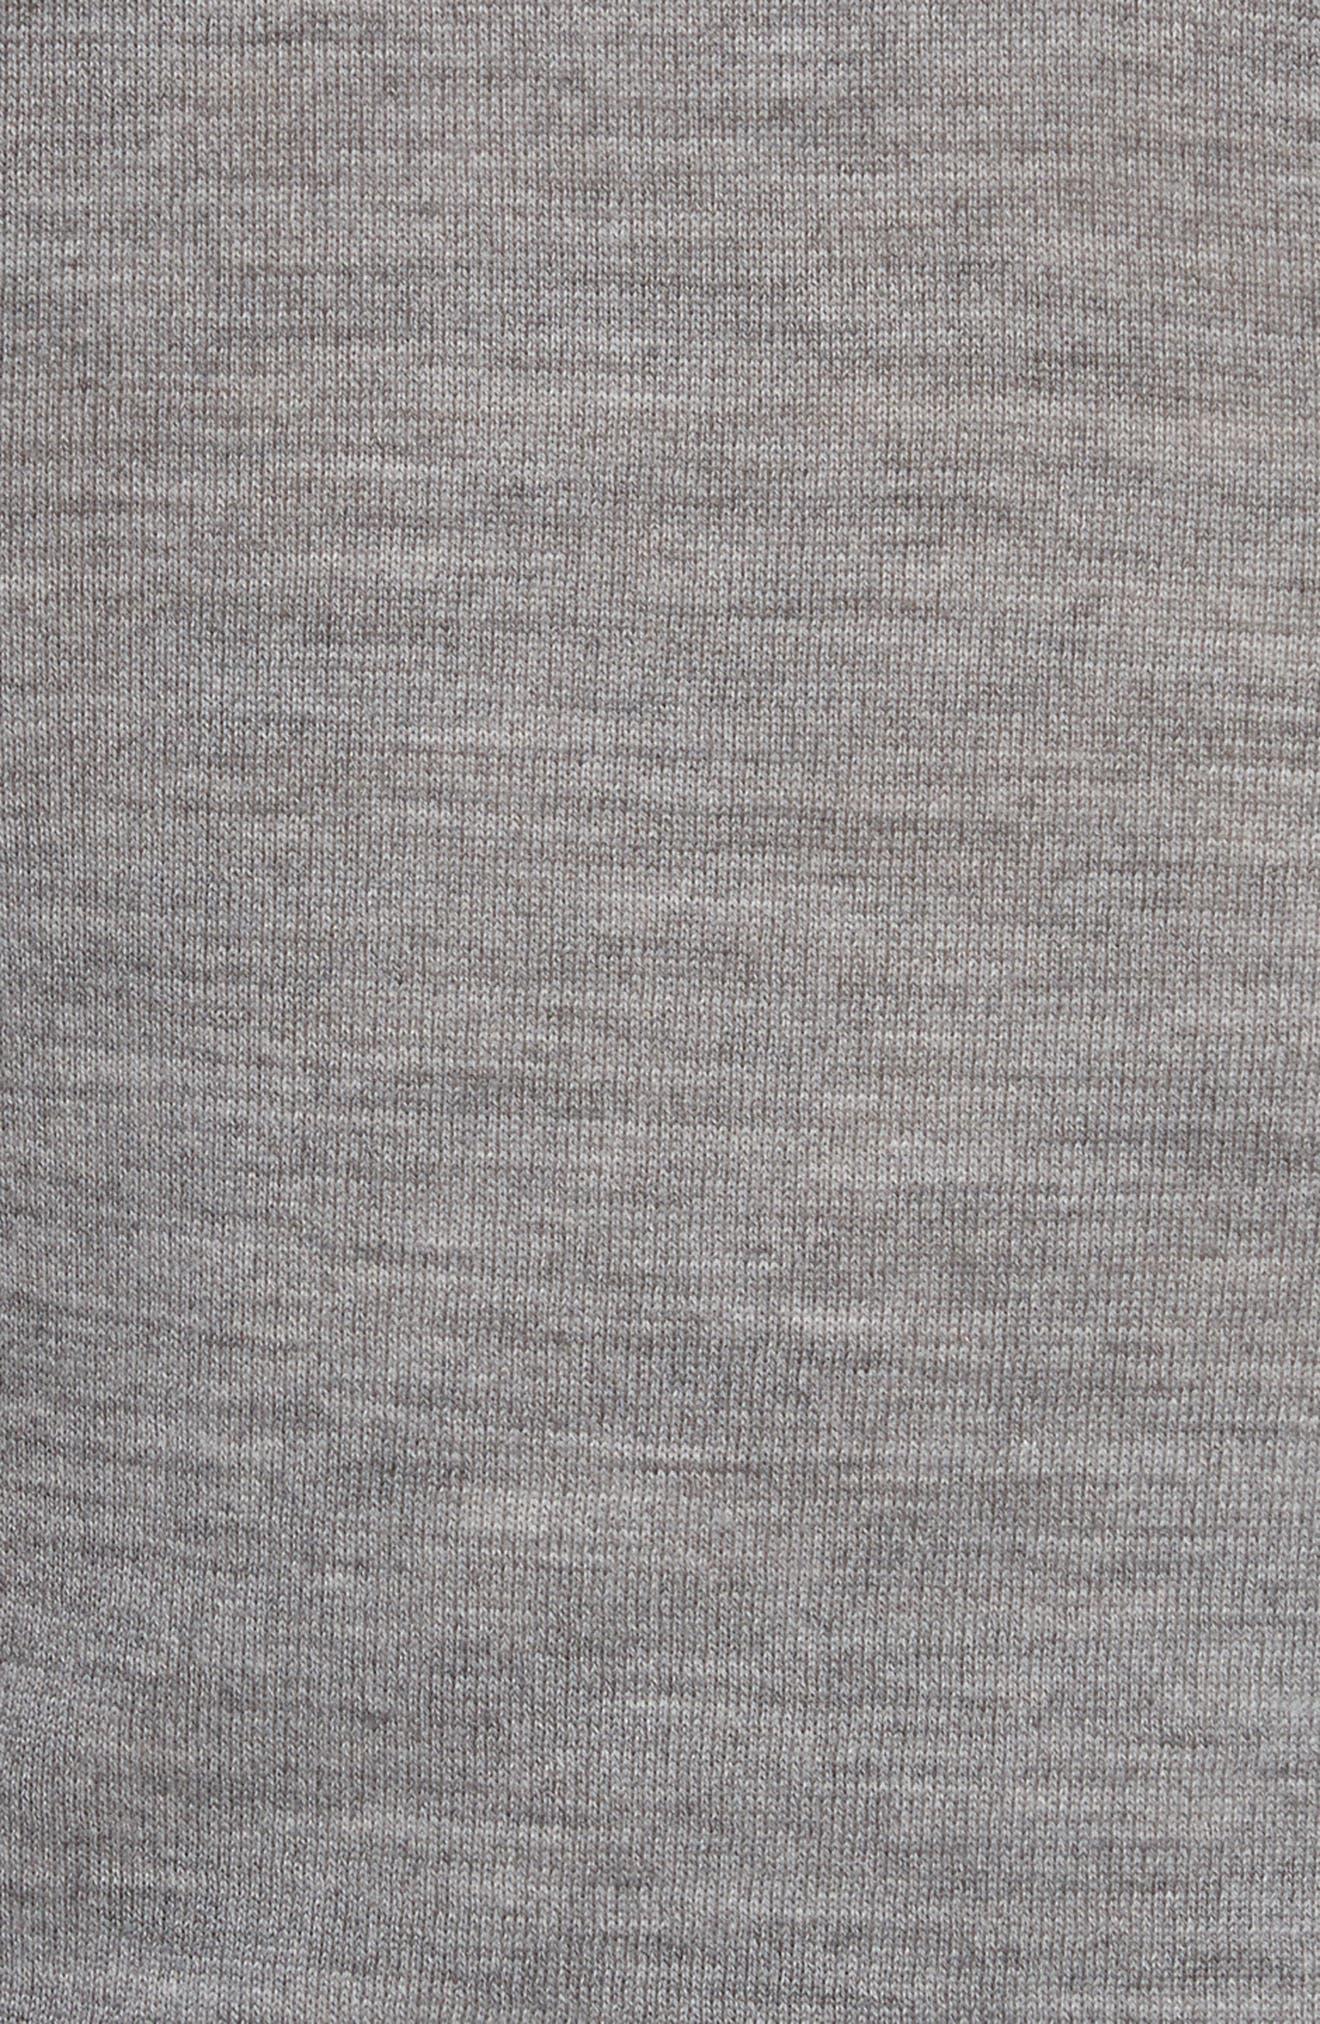 T by Alexander Wang Knit Merino Wool Layered Top,                             Alternate thumbnail 5, color,                             032